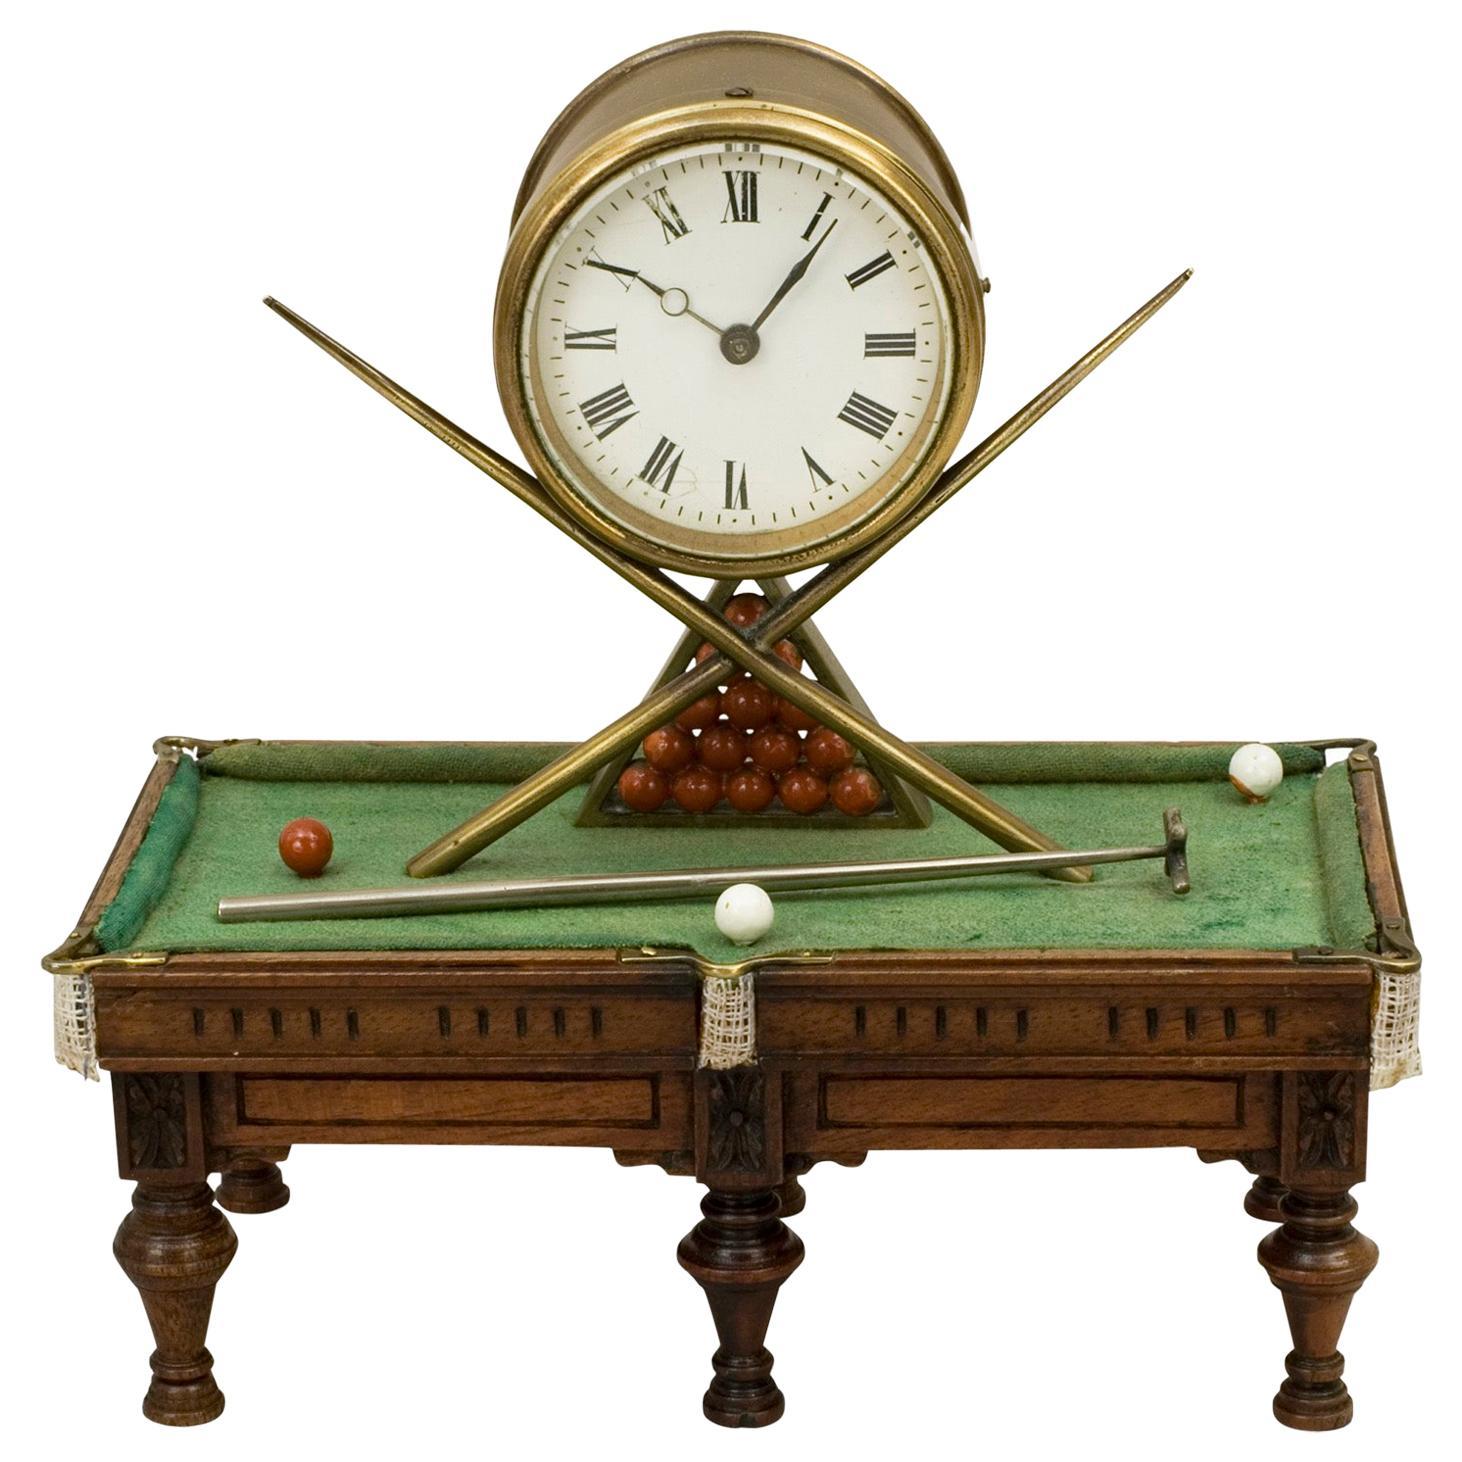 Antique Novelty Billiard Clock